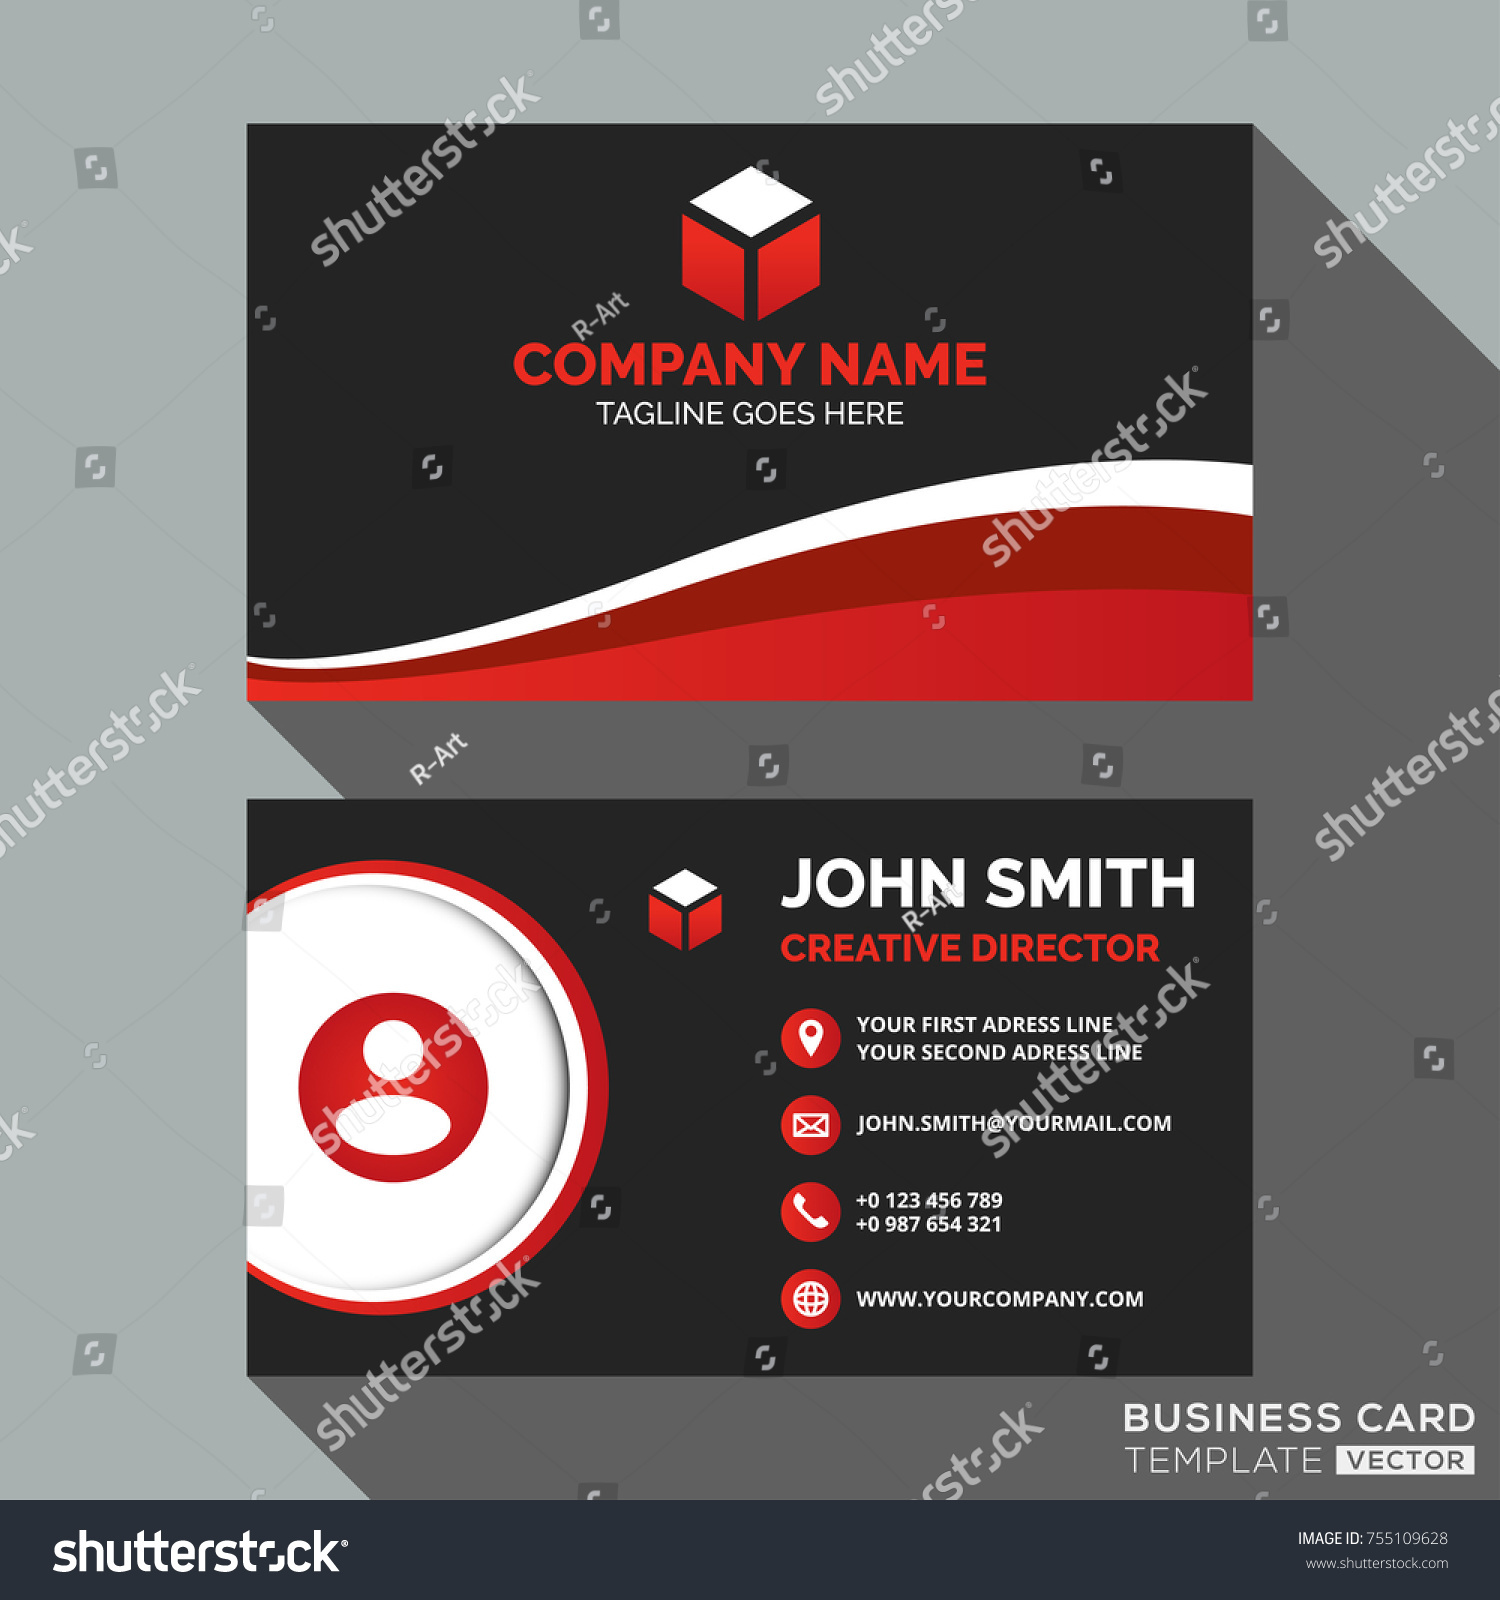 Dark red business card template design stock vector royalty free dark and red business card template design wajeb Images